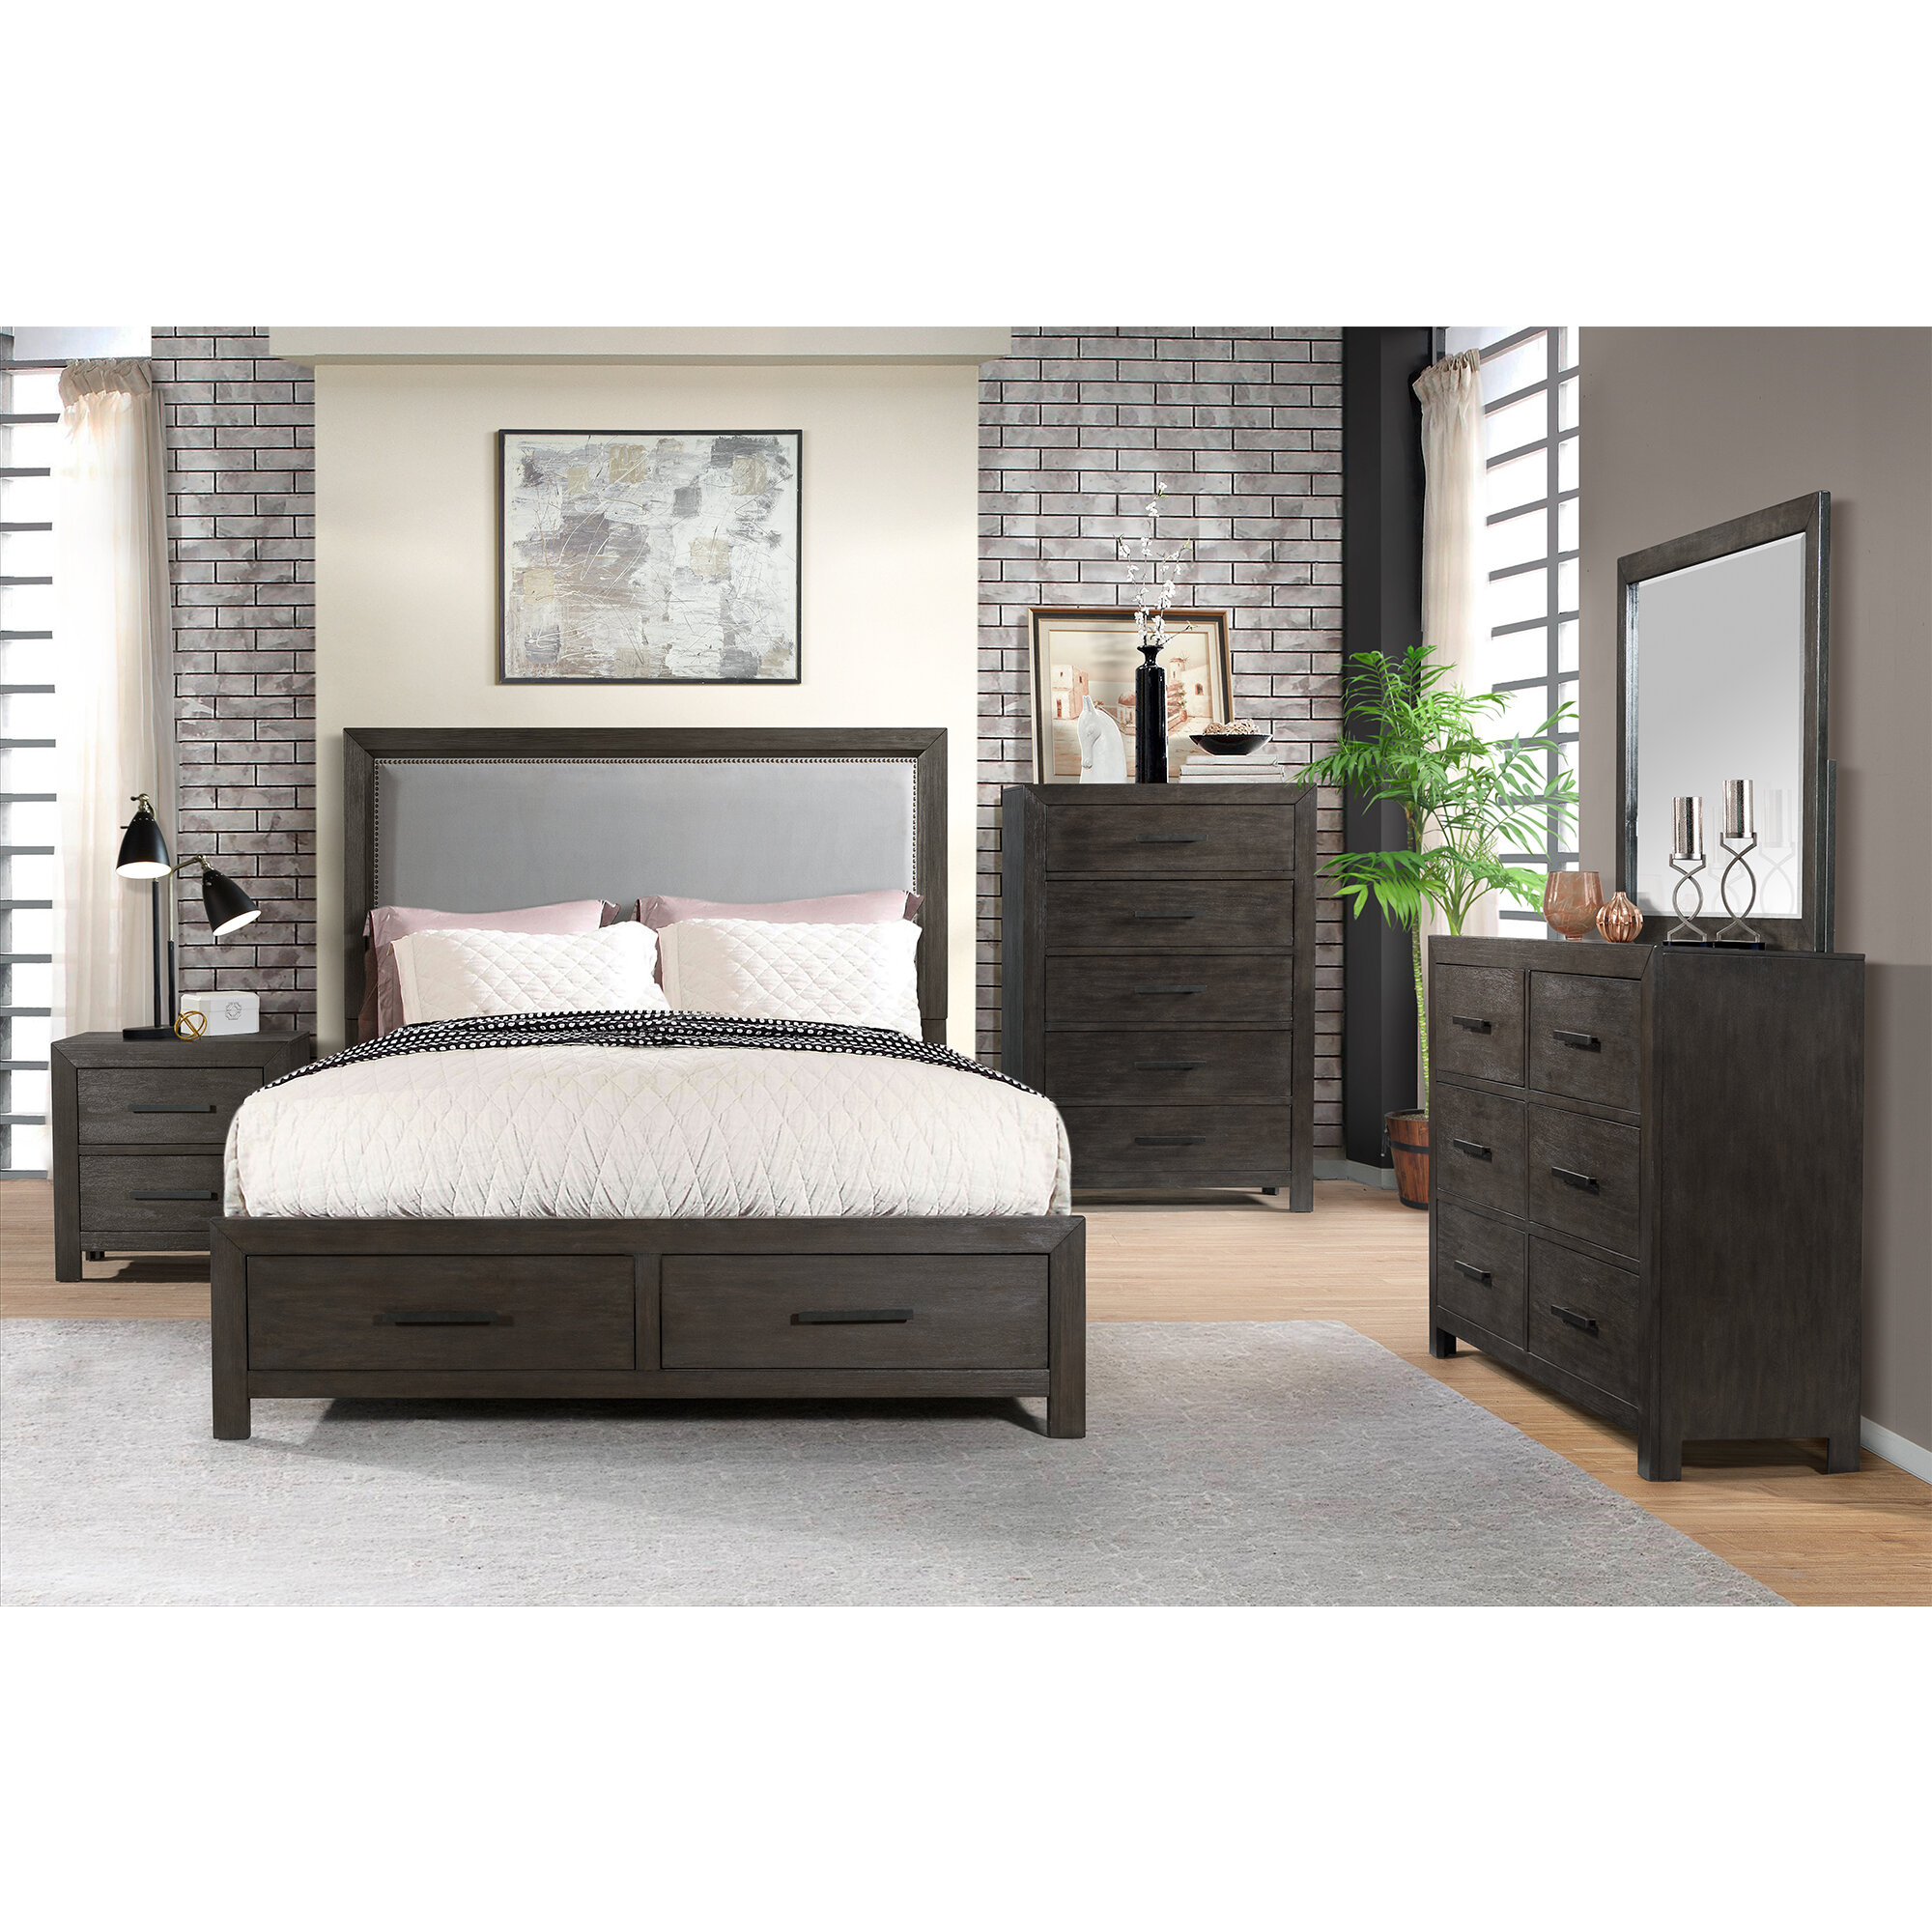 Gracie Oaks Mccorkle Platform 5 Piece Bedroom Set Reviews Wayfair